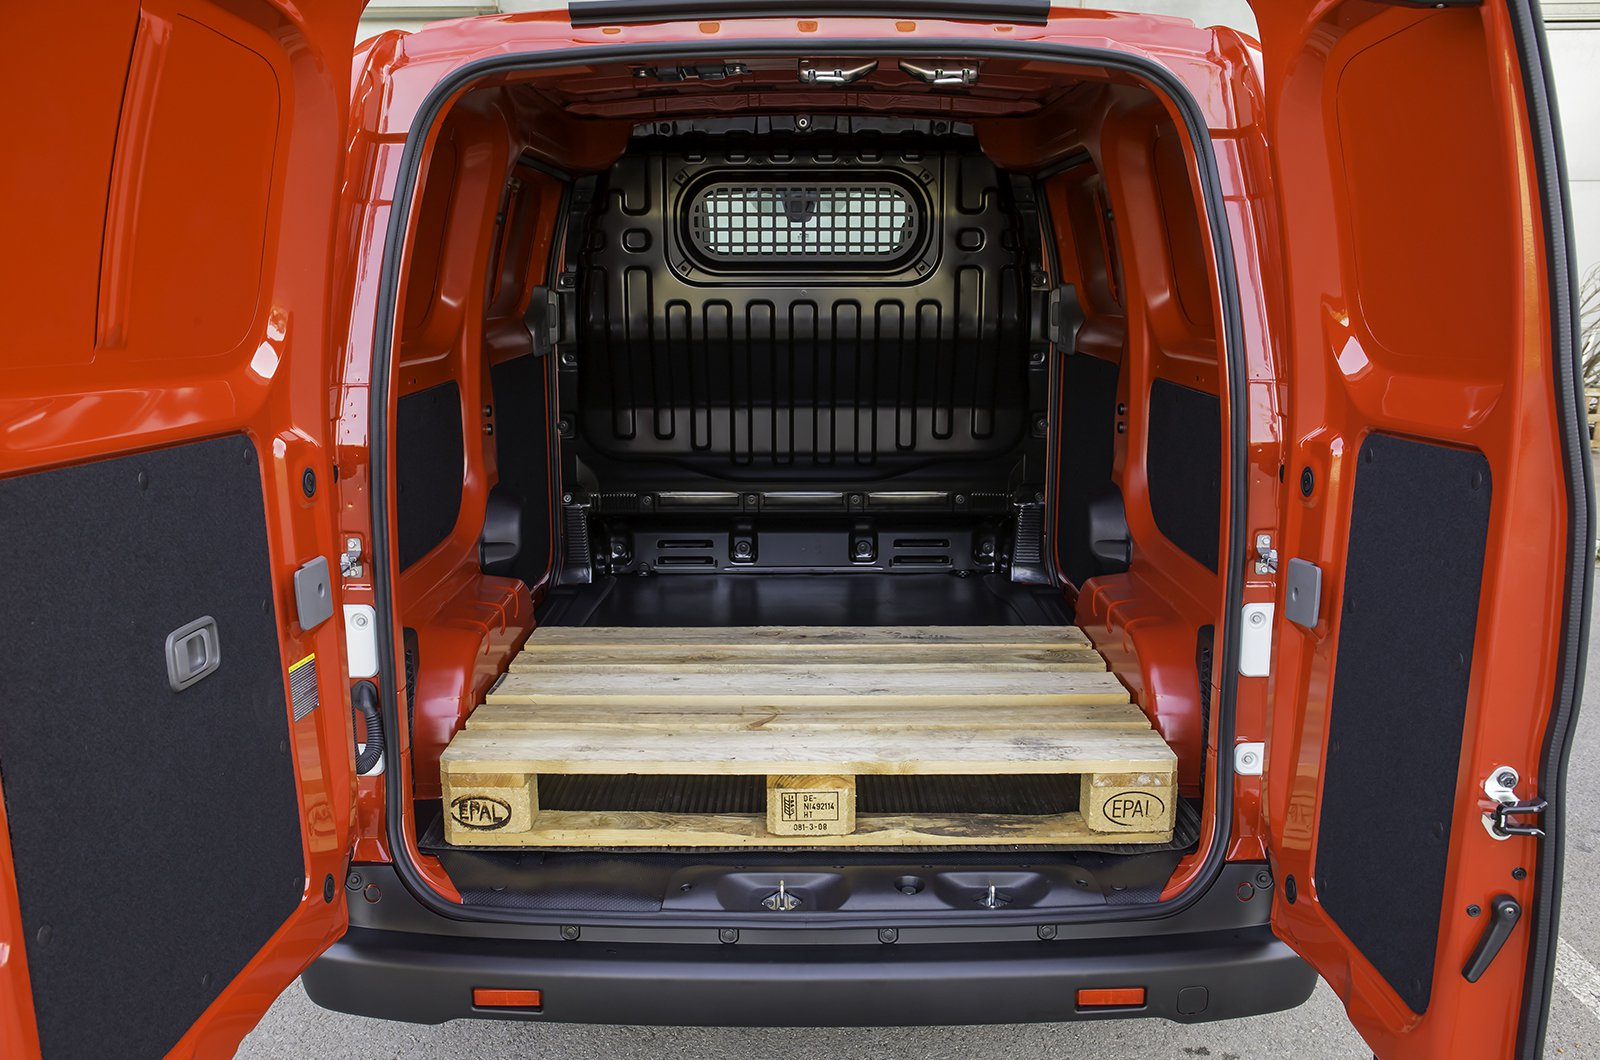 Nissan e-NV200 load space